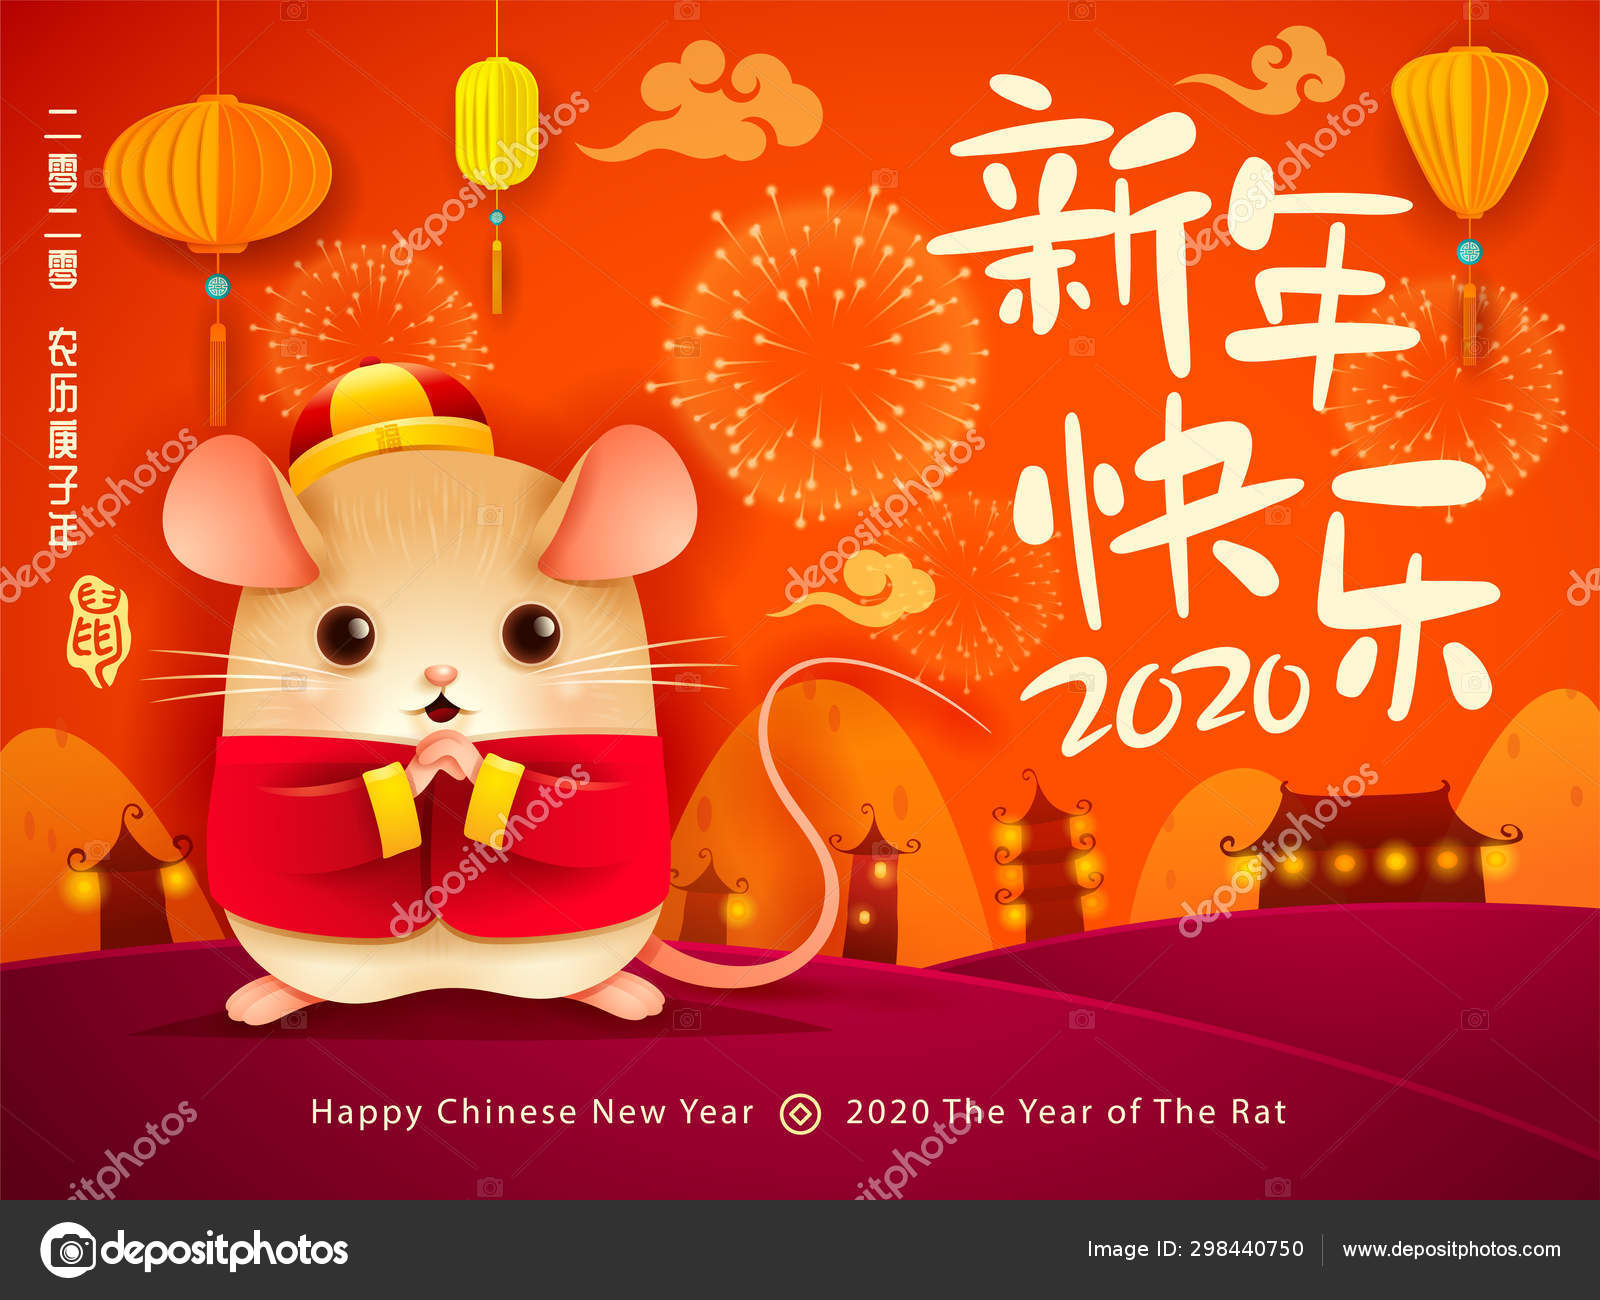 Happy Chinese New Year 2020.Happy Chinese New Year 2020 Stock Vector C Ori Artiste